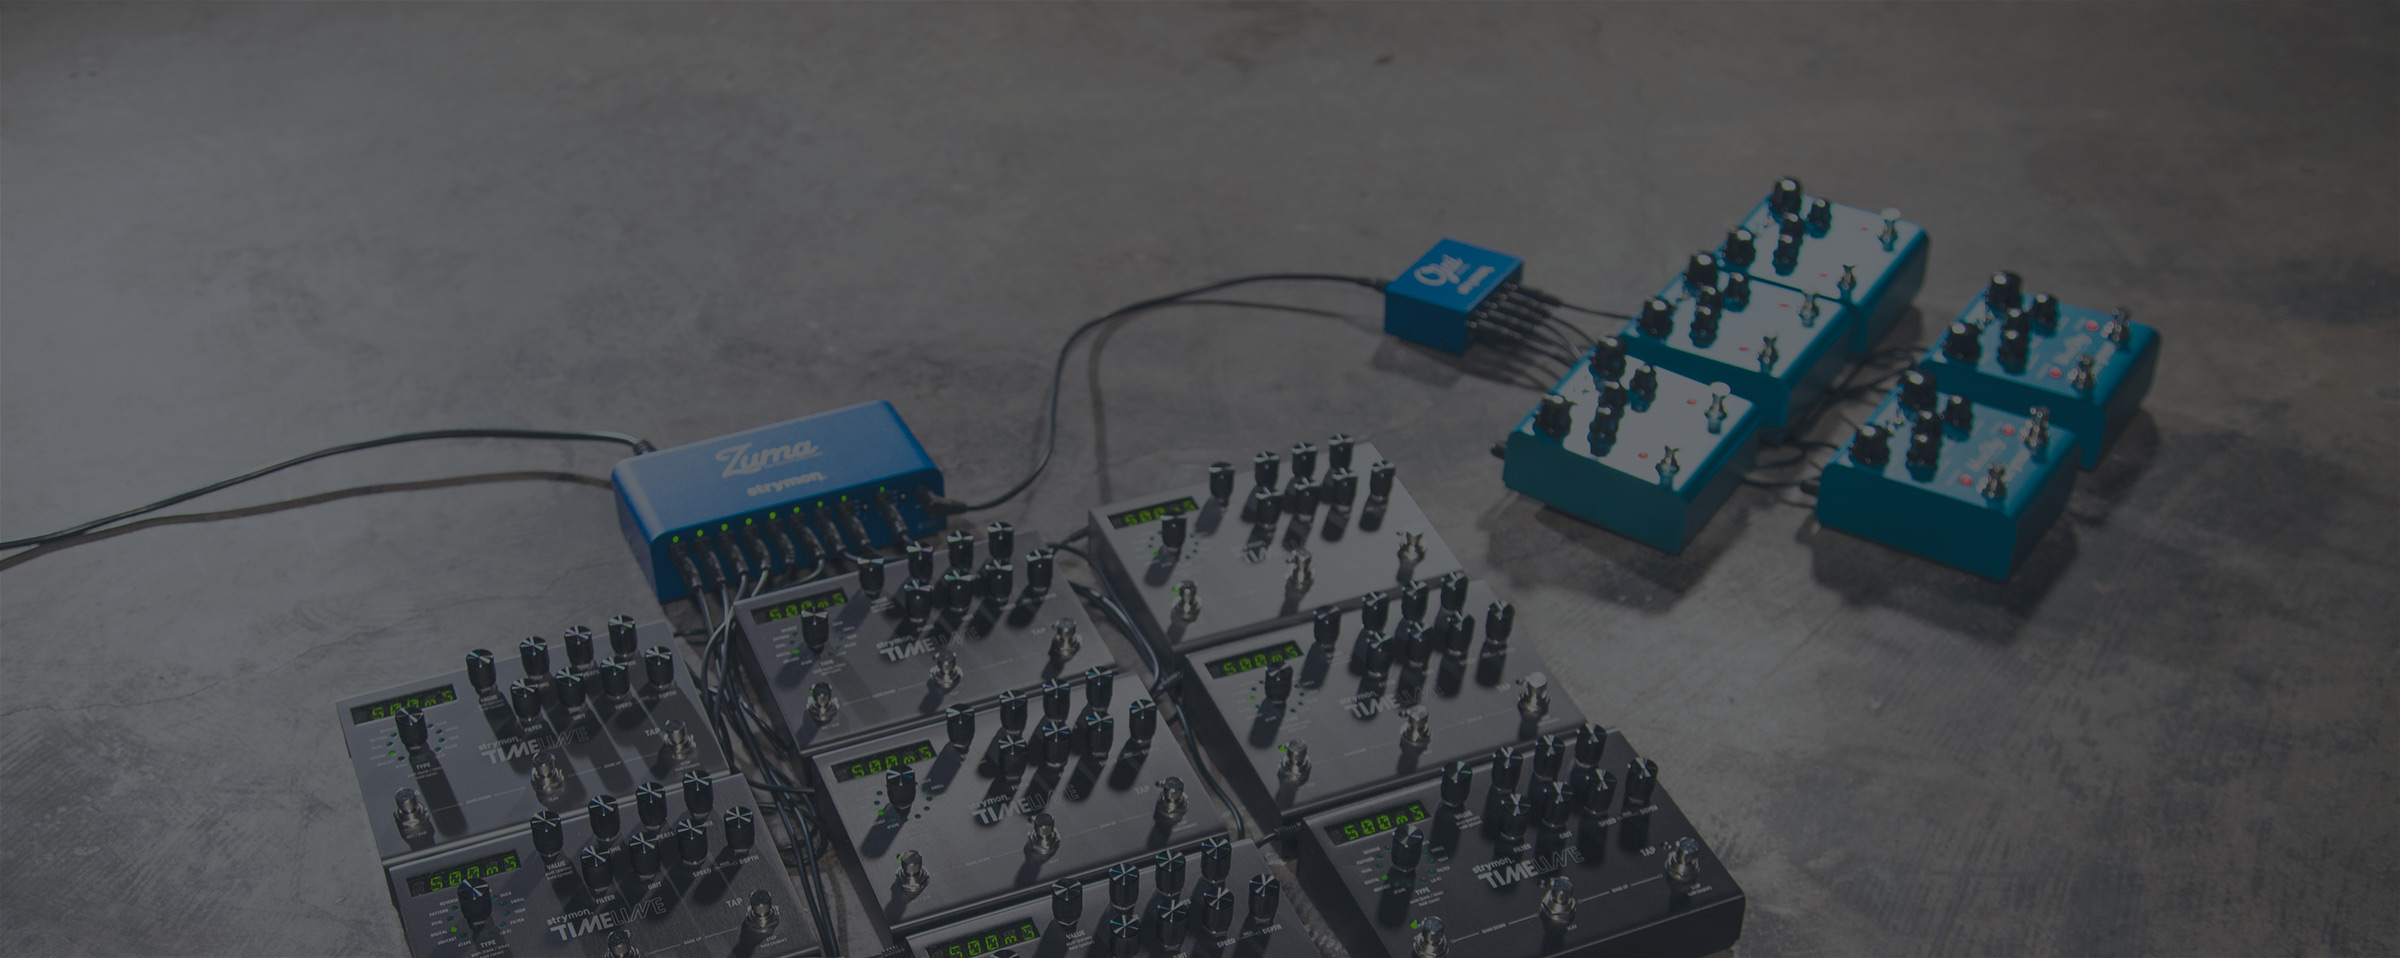 power-supply-thumb.jpg